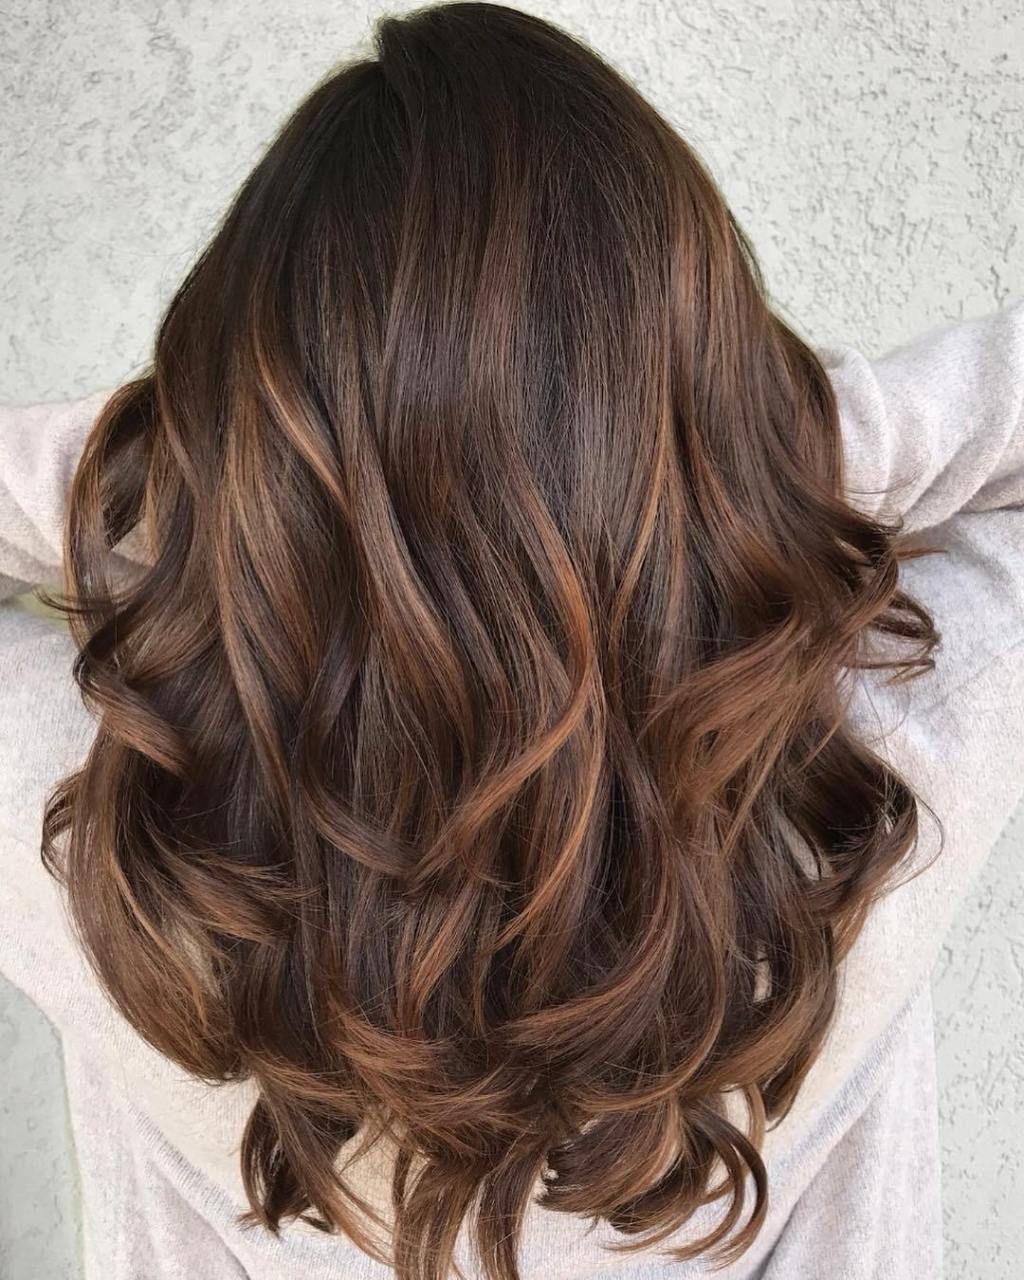 16 Creative Dark Brown Hair Color Highlights Ideas Fashionable Long Brunette Hair Hair Color Asian Balayage Hair